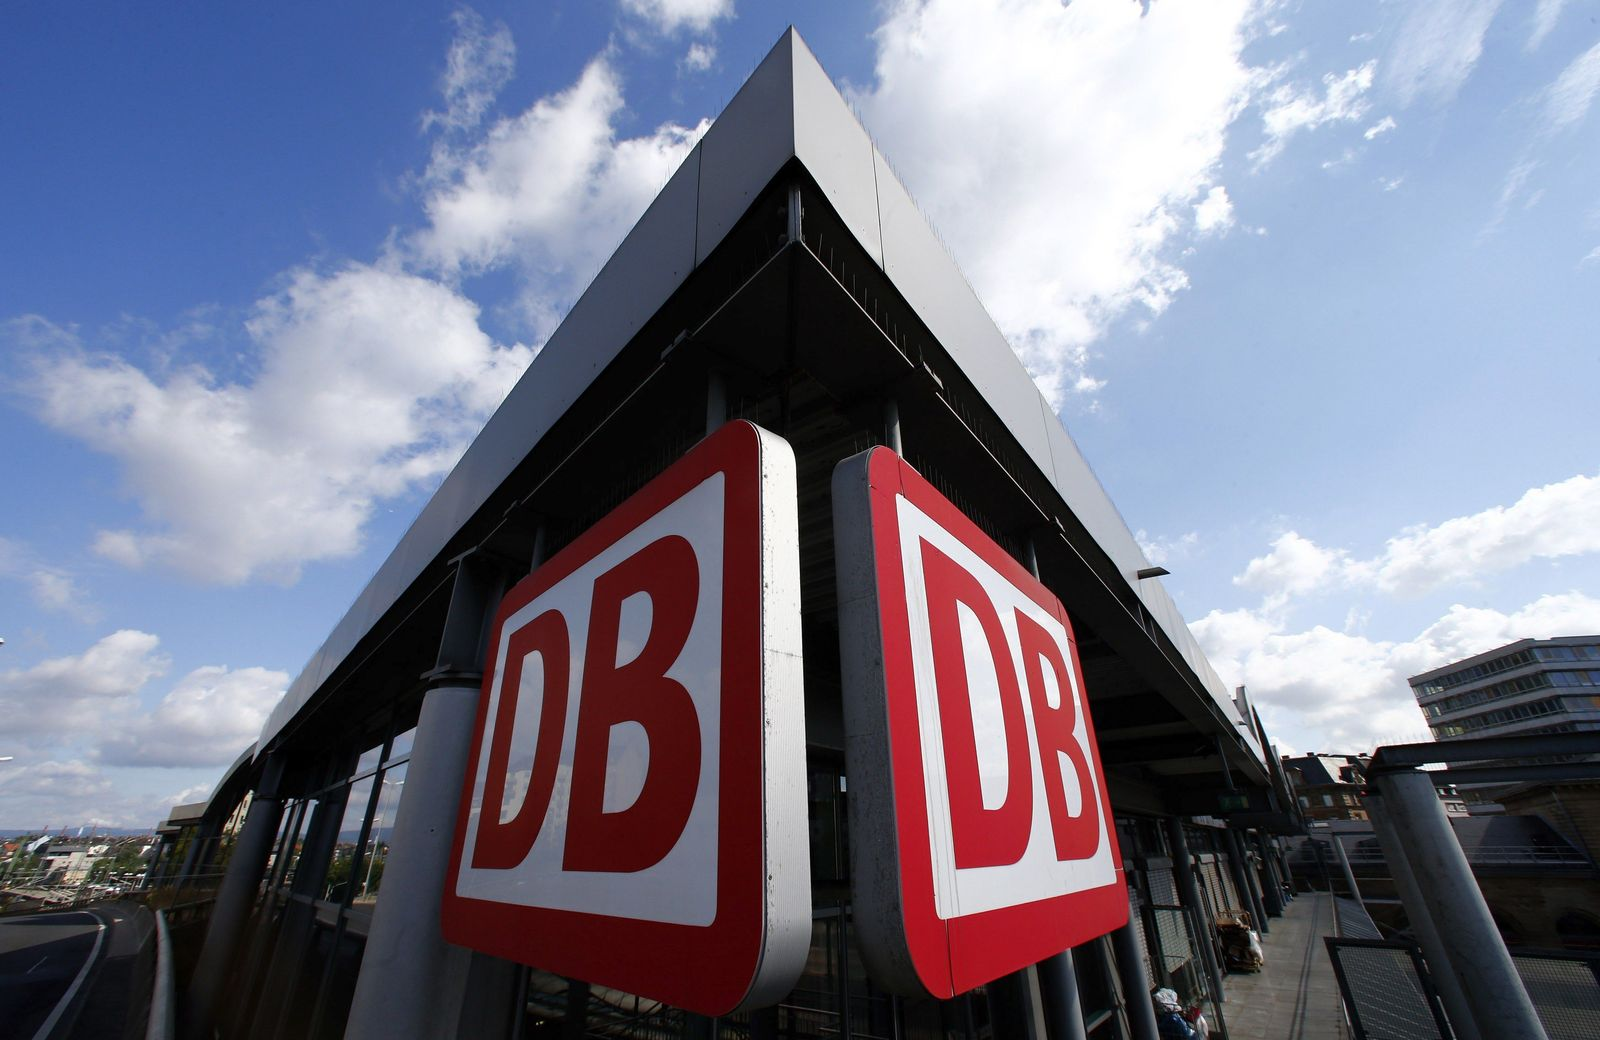 Deutsche Bahn/ Mainz/ Bahnhof